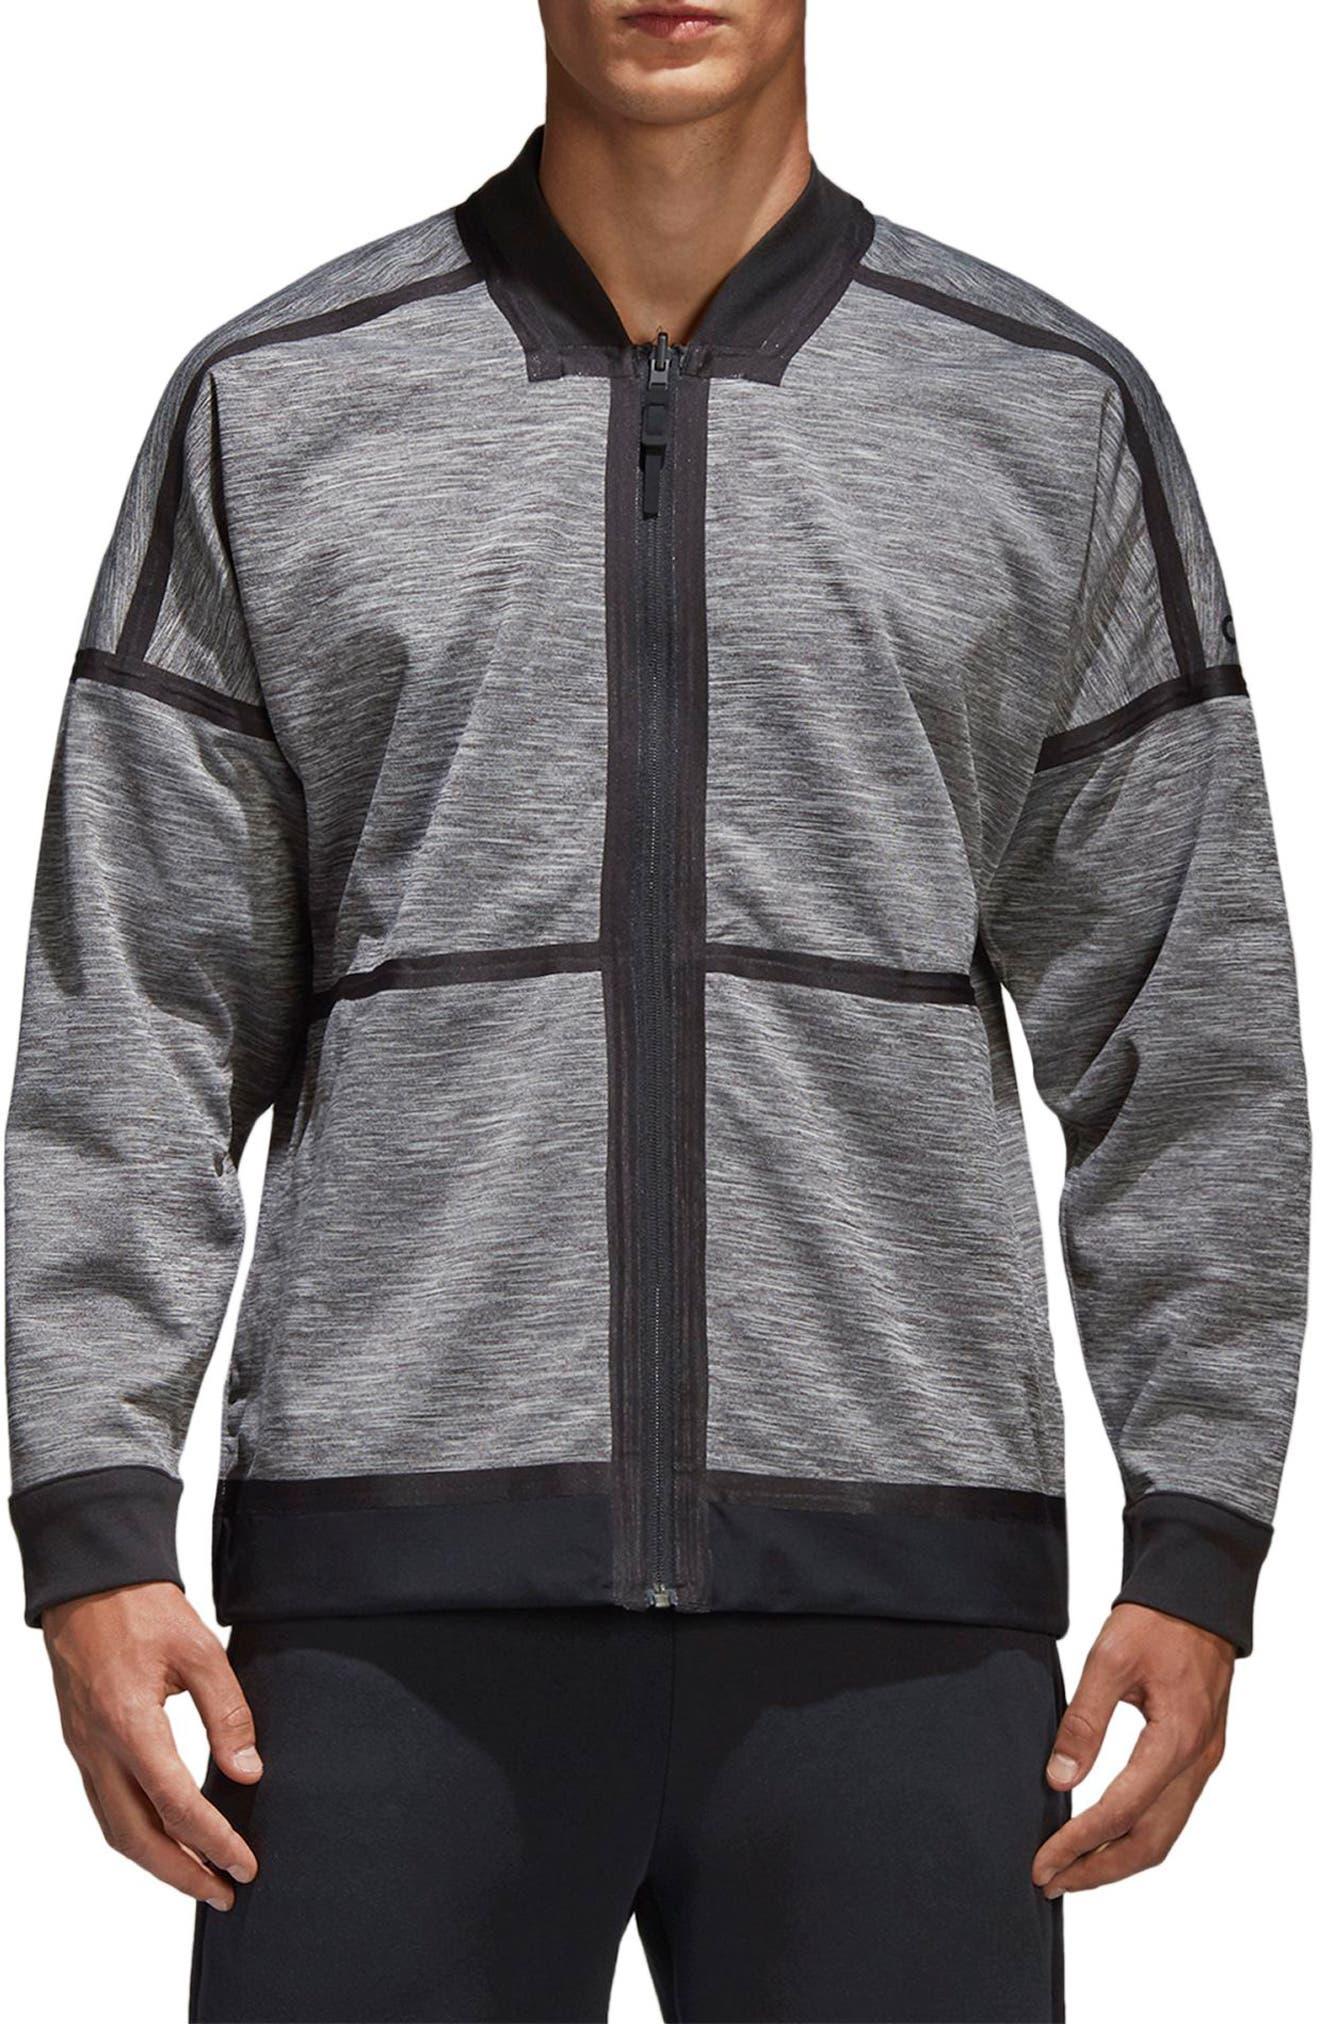 Main Image - adidas Z.N.E. Reversible Ventilated Jacket